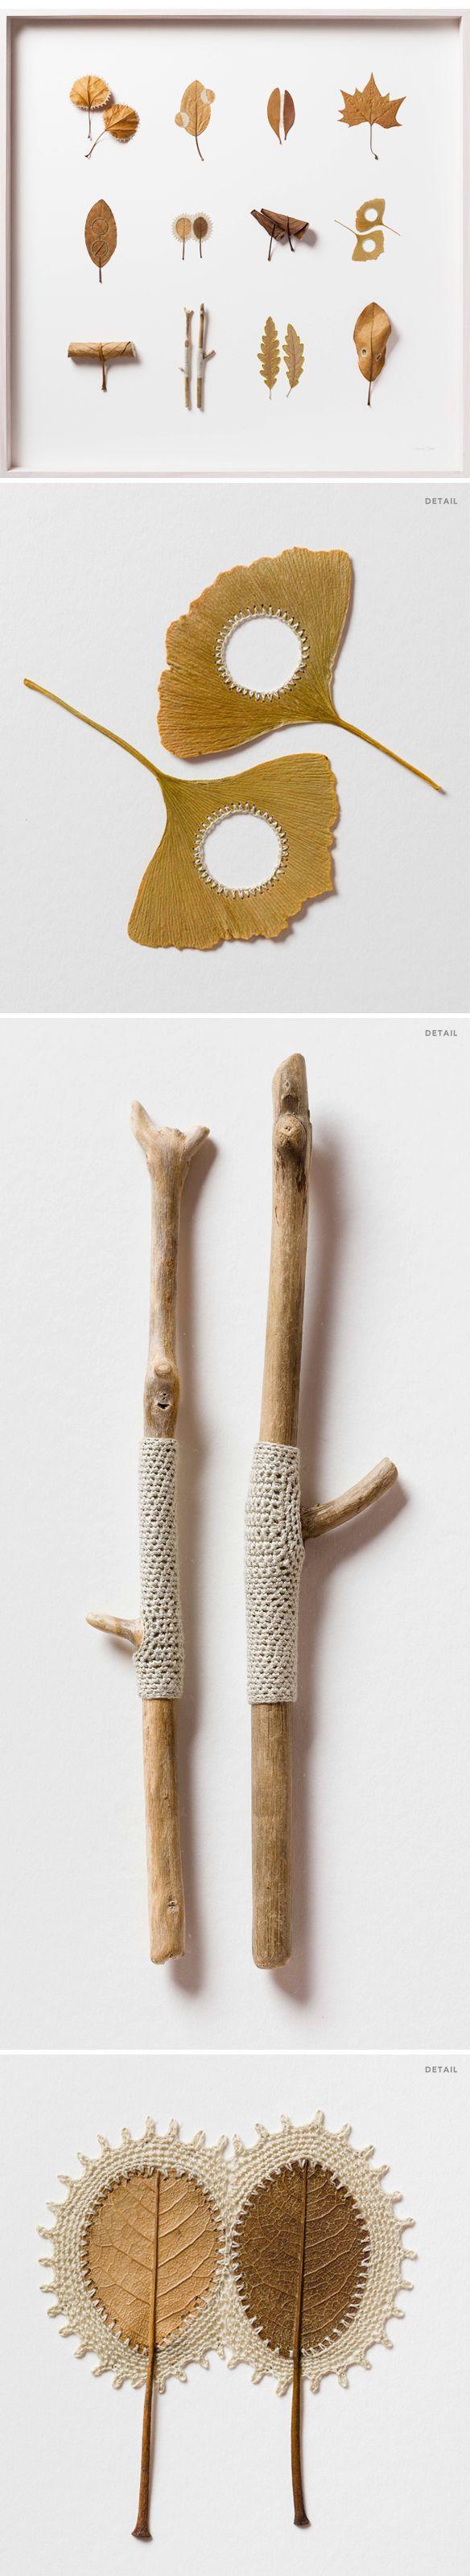 302 best Crafts ÷ NaturBastelei :: nature crafts images on ...